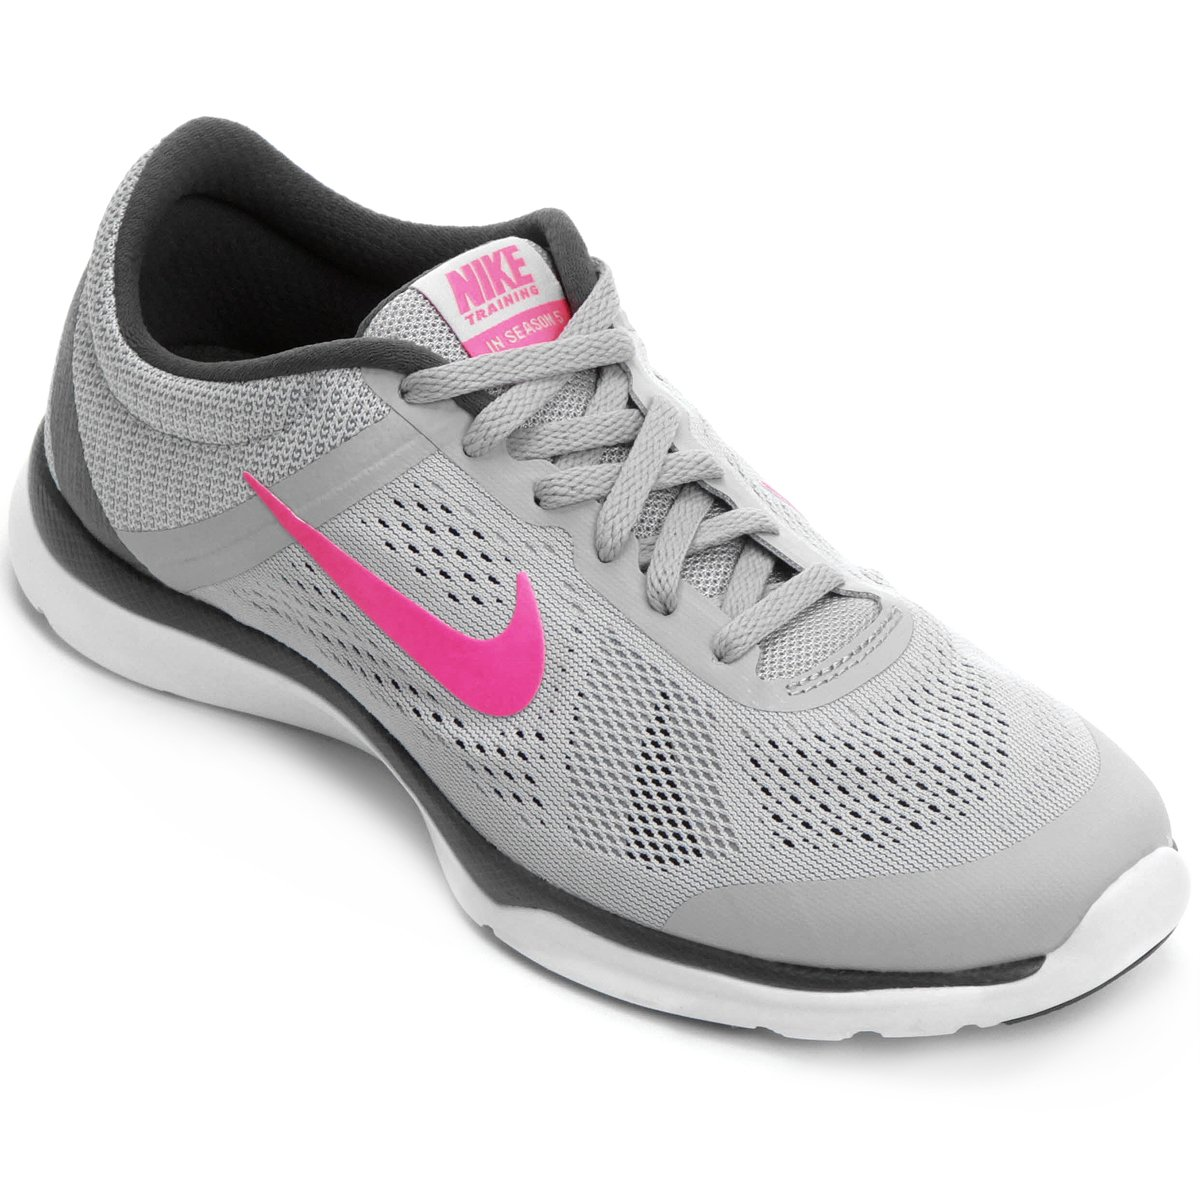 Tênis Nike In-Season Tr 5 - Compre Agora  2a51a5c03a